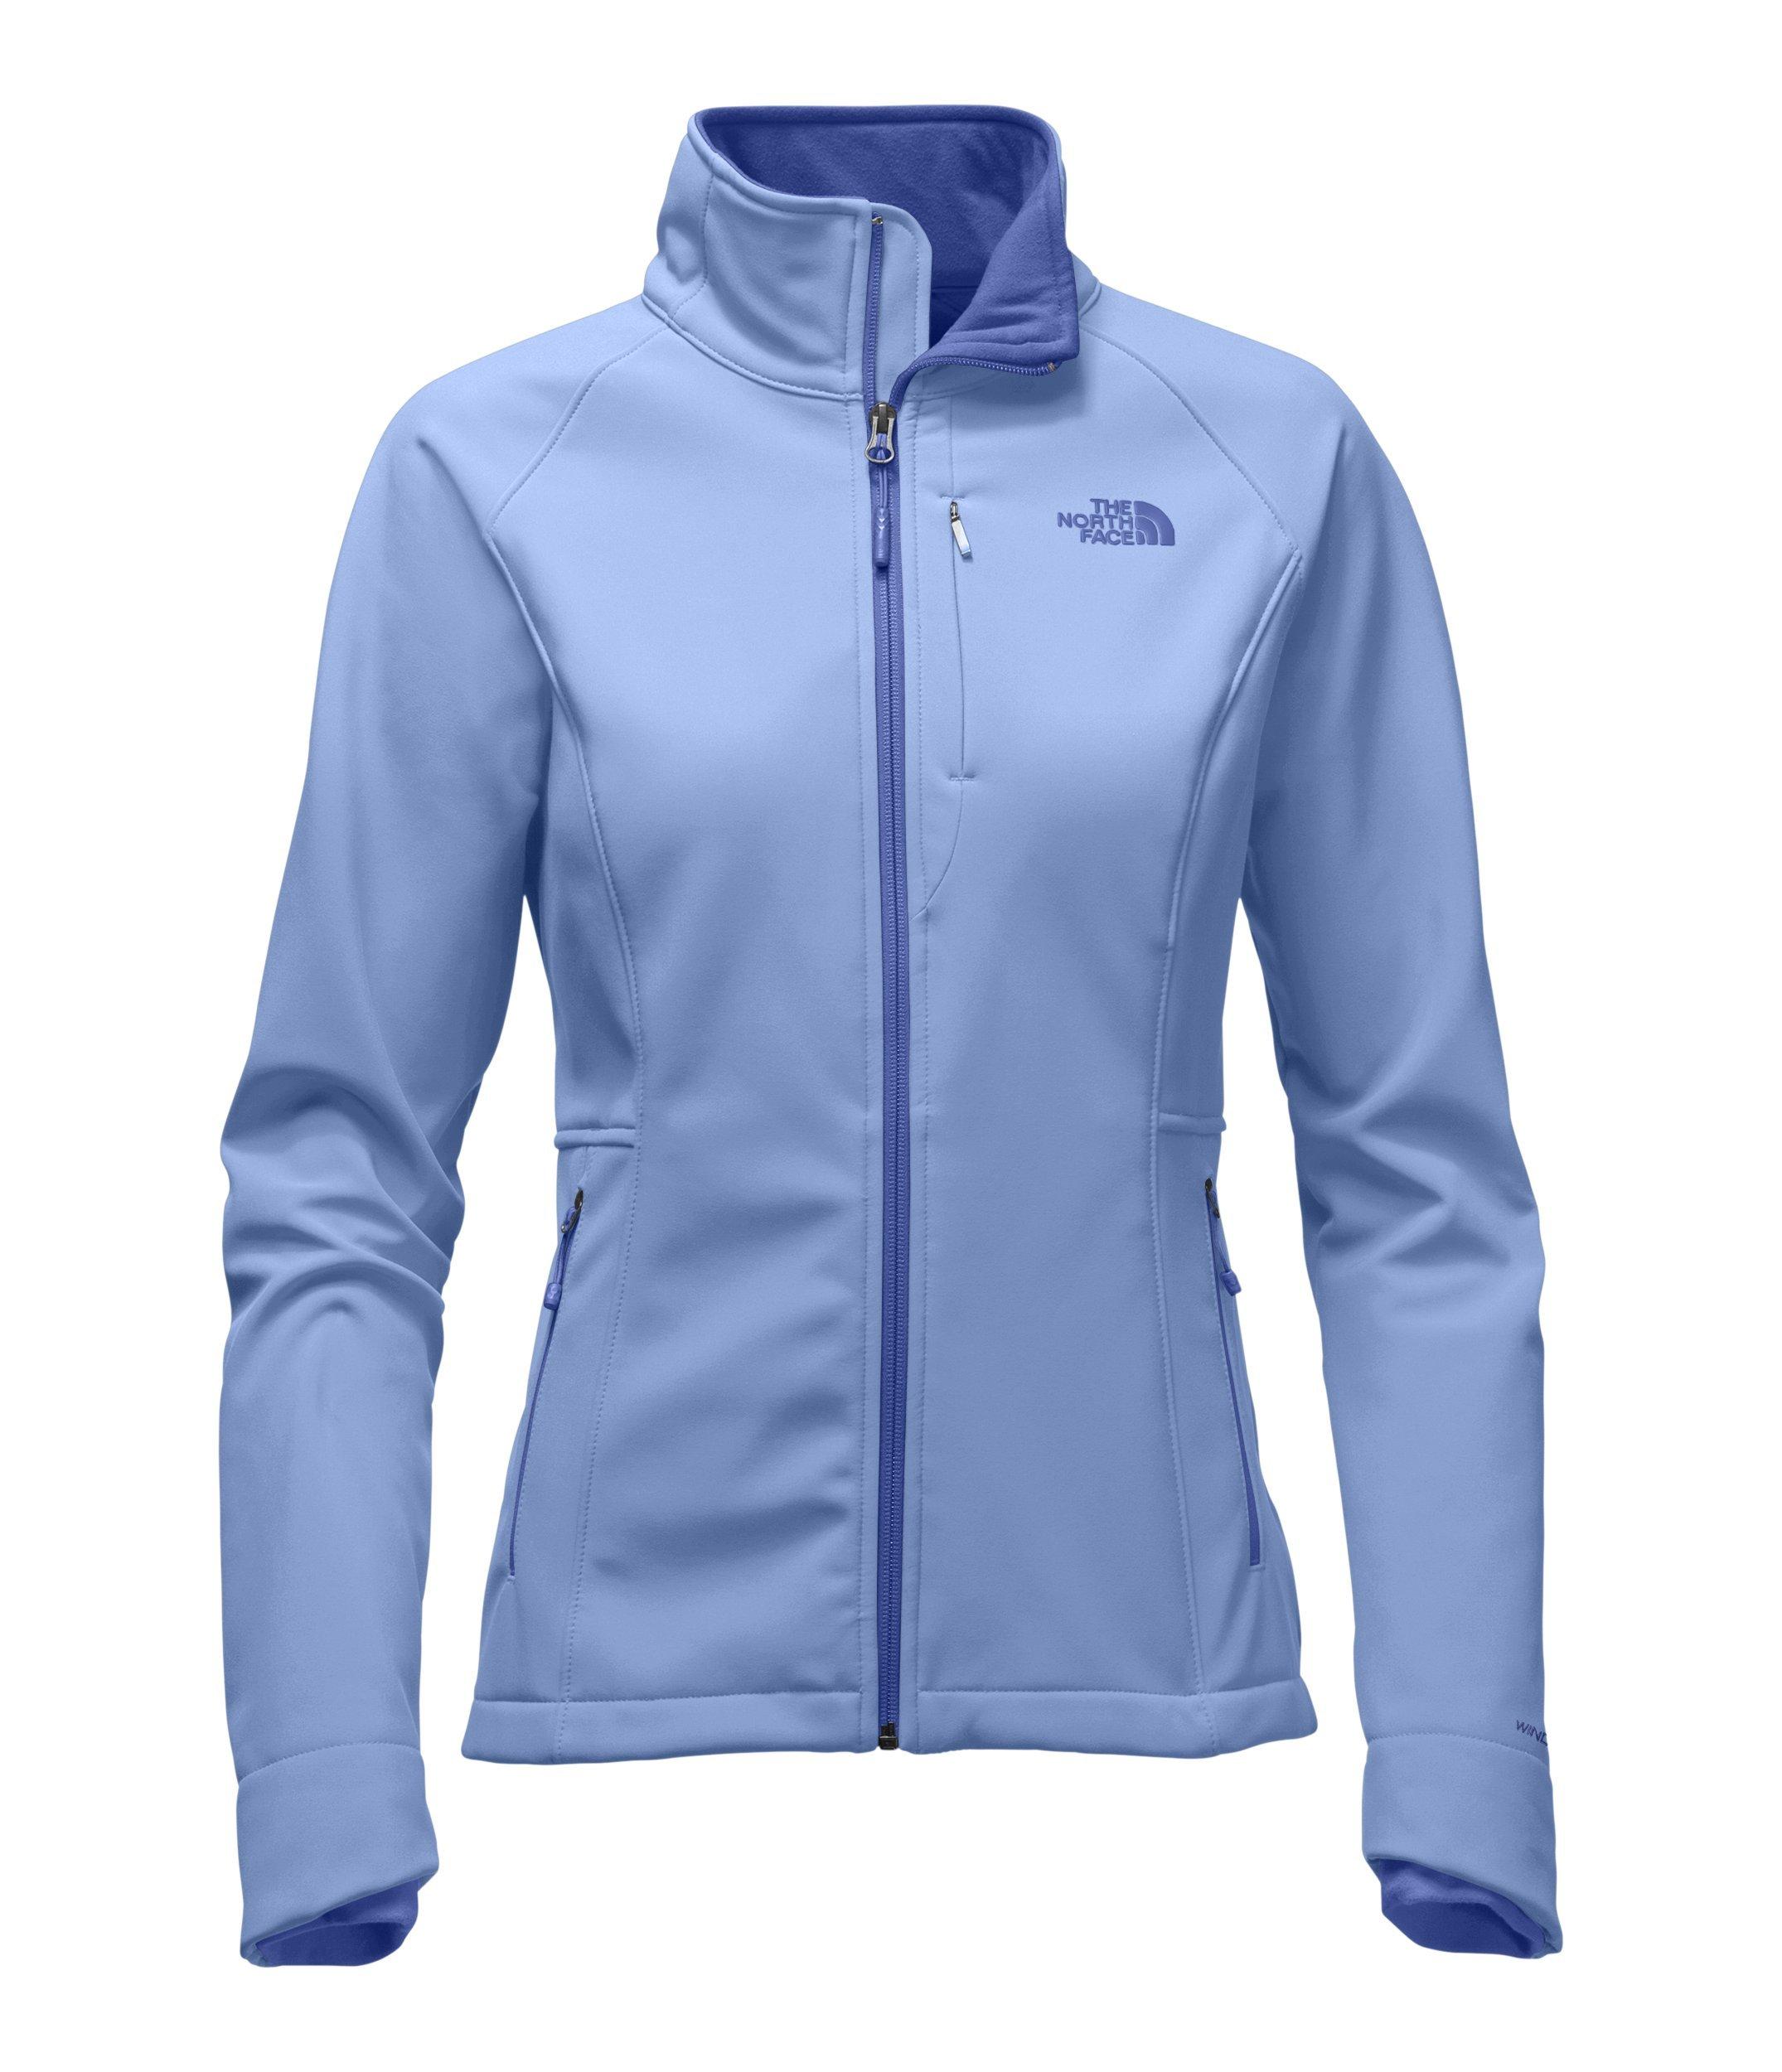 05f0e9b18 The North Face Women's Apex Bionic 2 Jacket - Collar Blue - XL